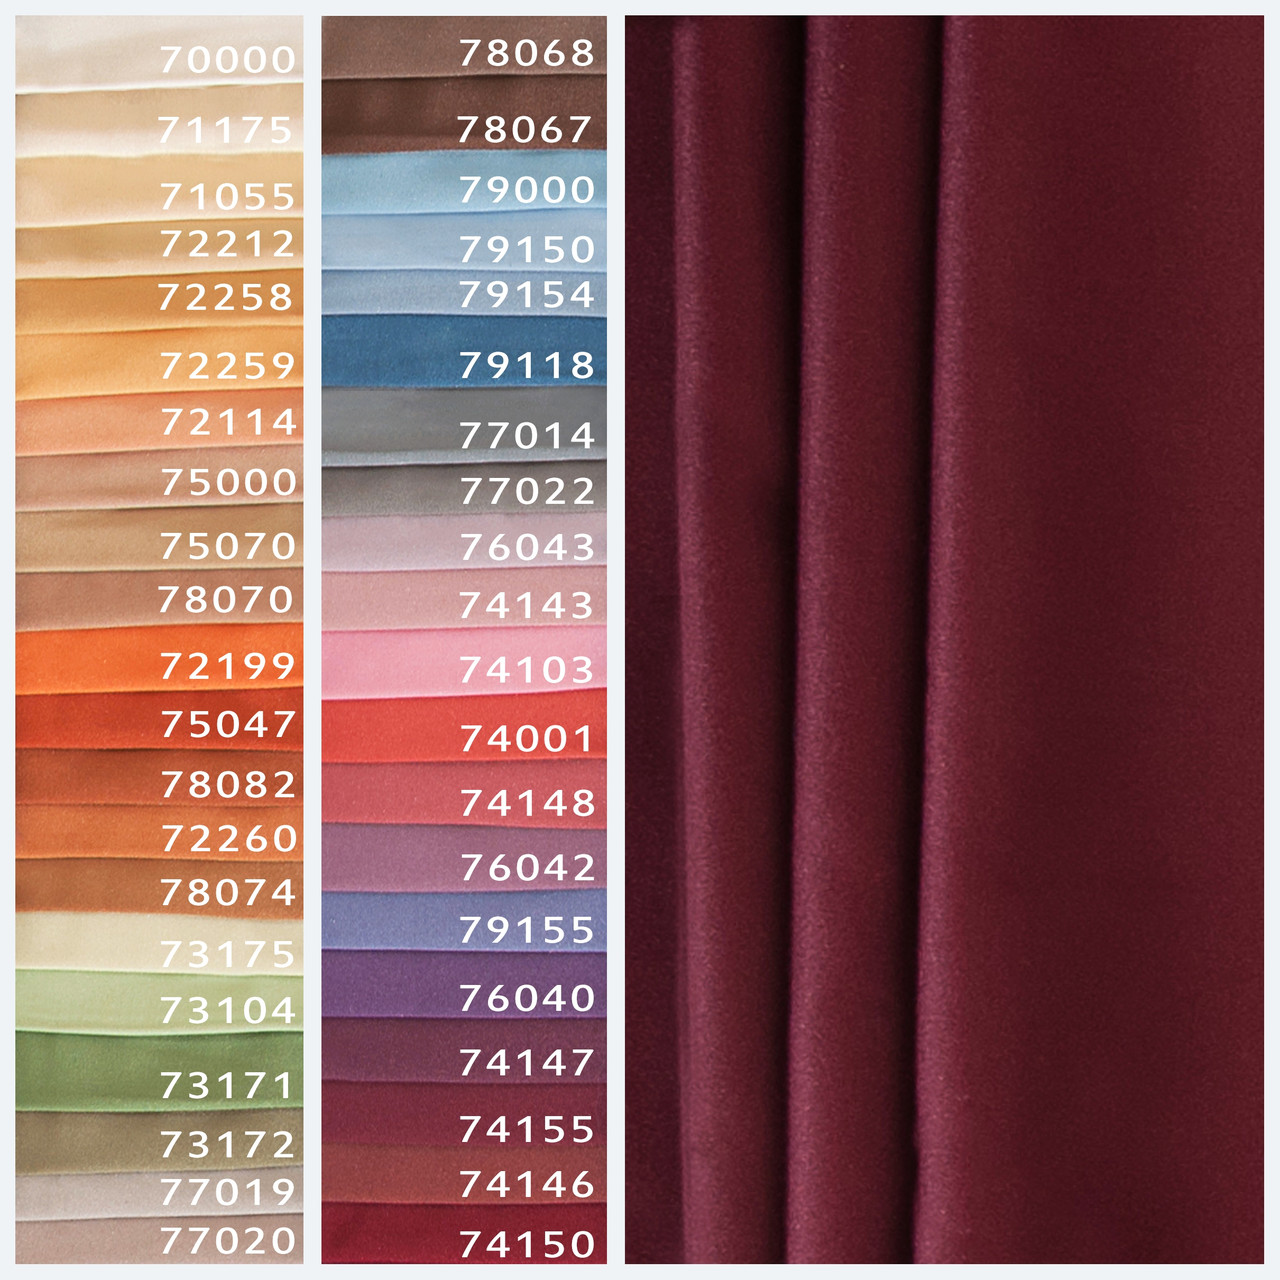 47fdbac5f1dabd Ткань для штор однотонная w1223 - Шторы Киев   Ткани для штор - Интернет- магазин